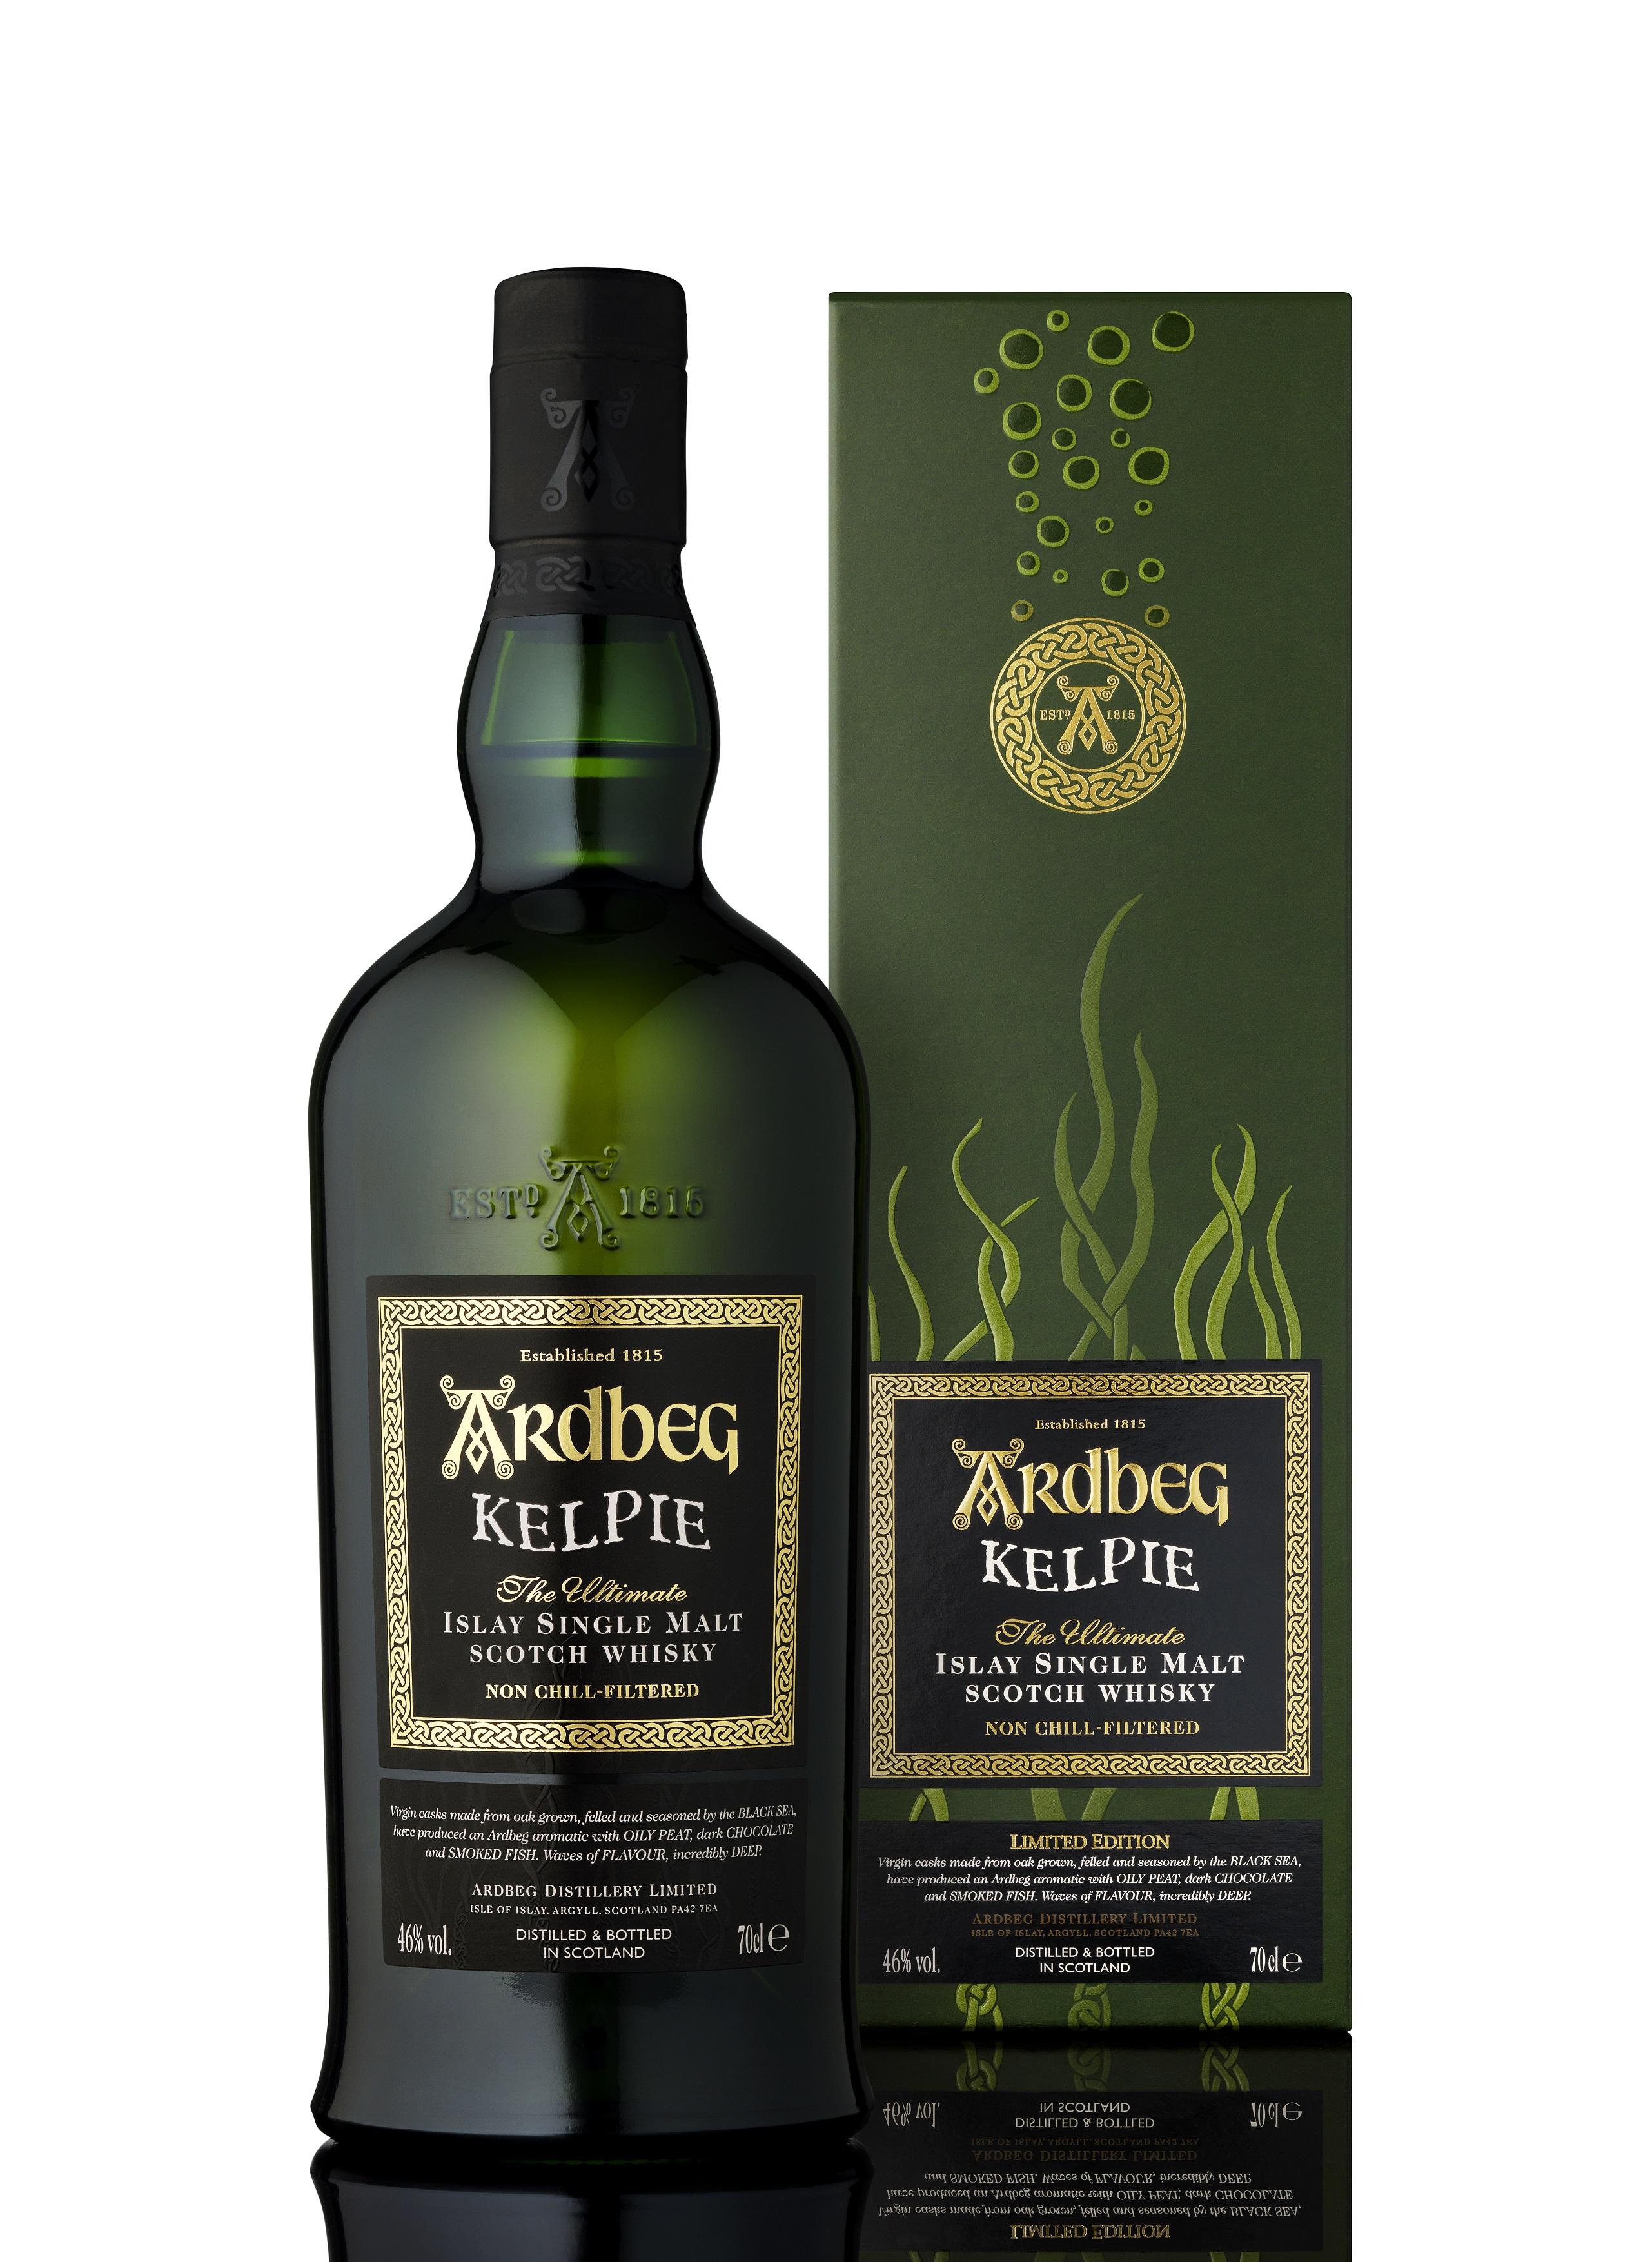 Ardbeg Kelpie Whisky